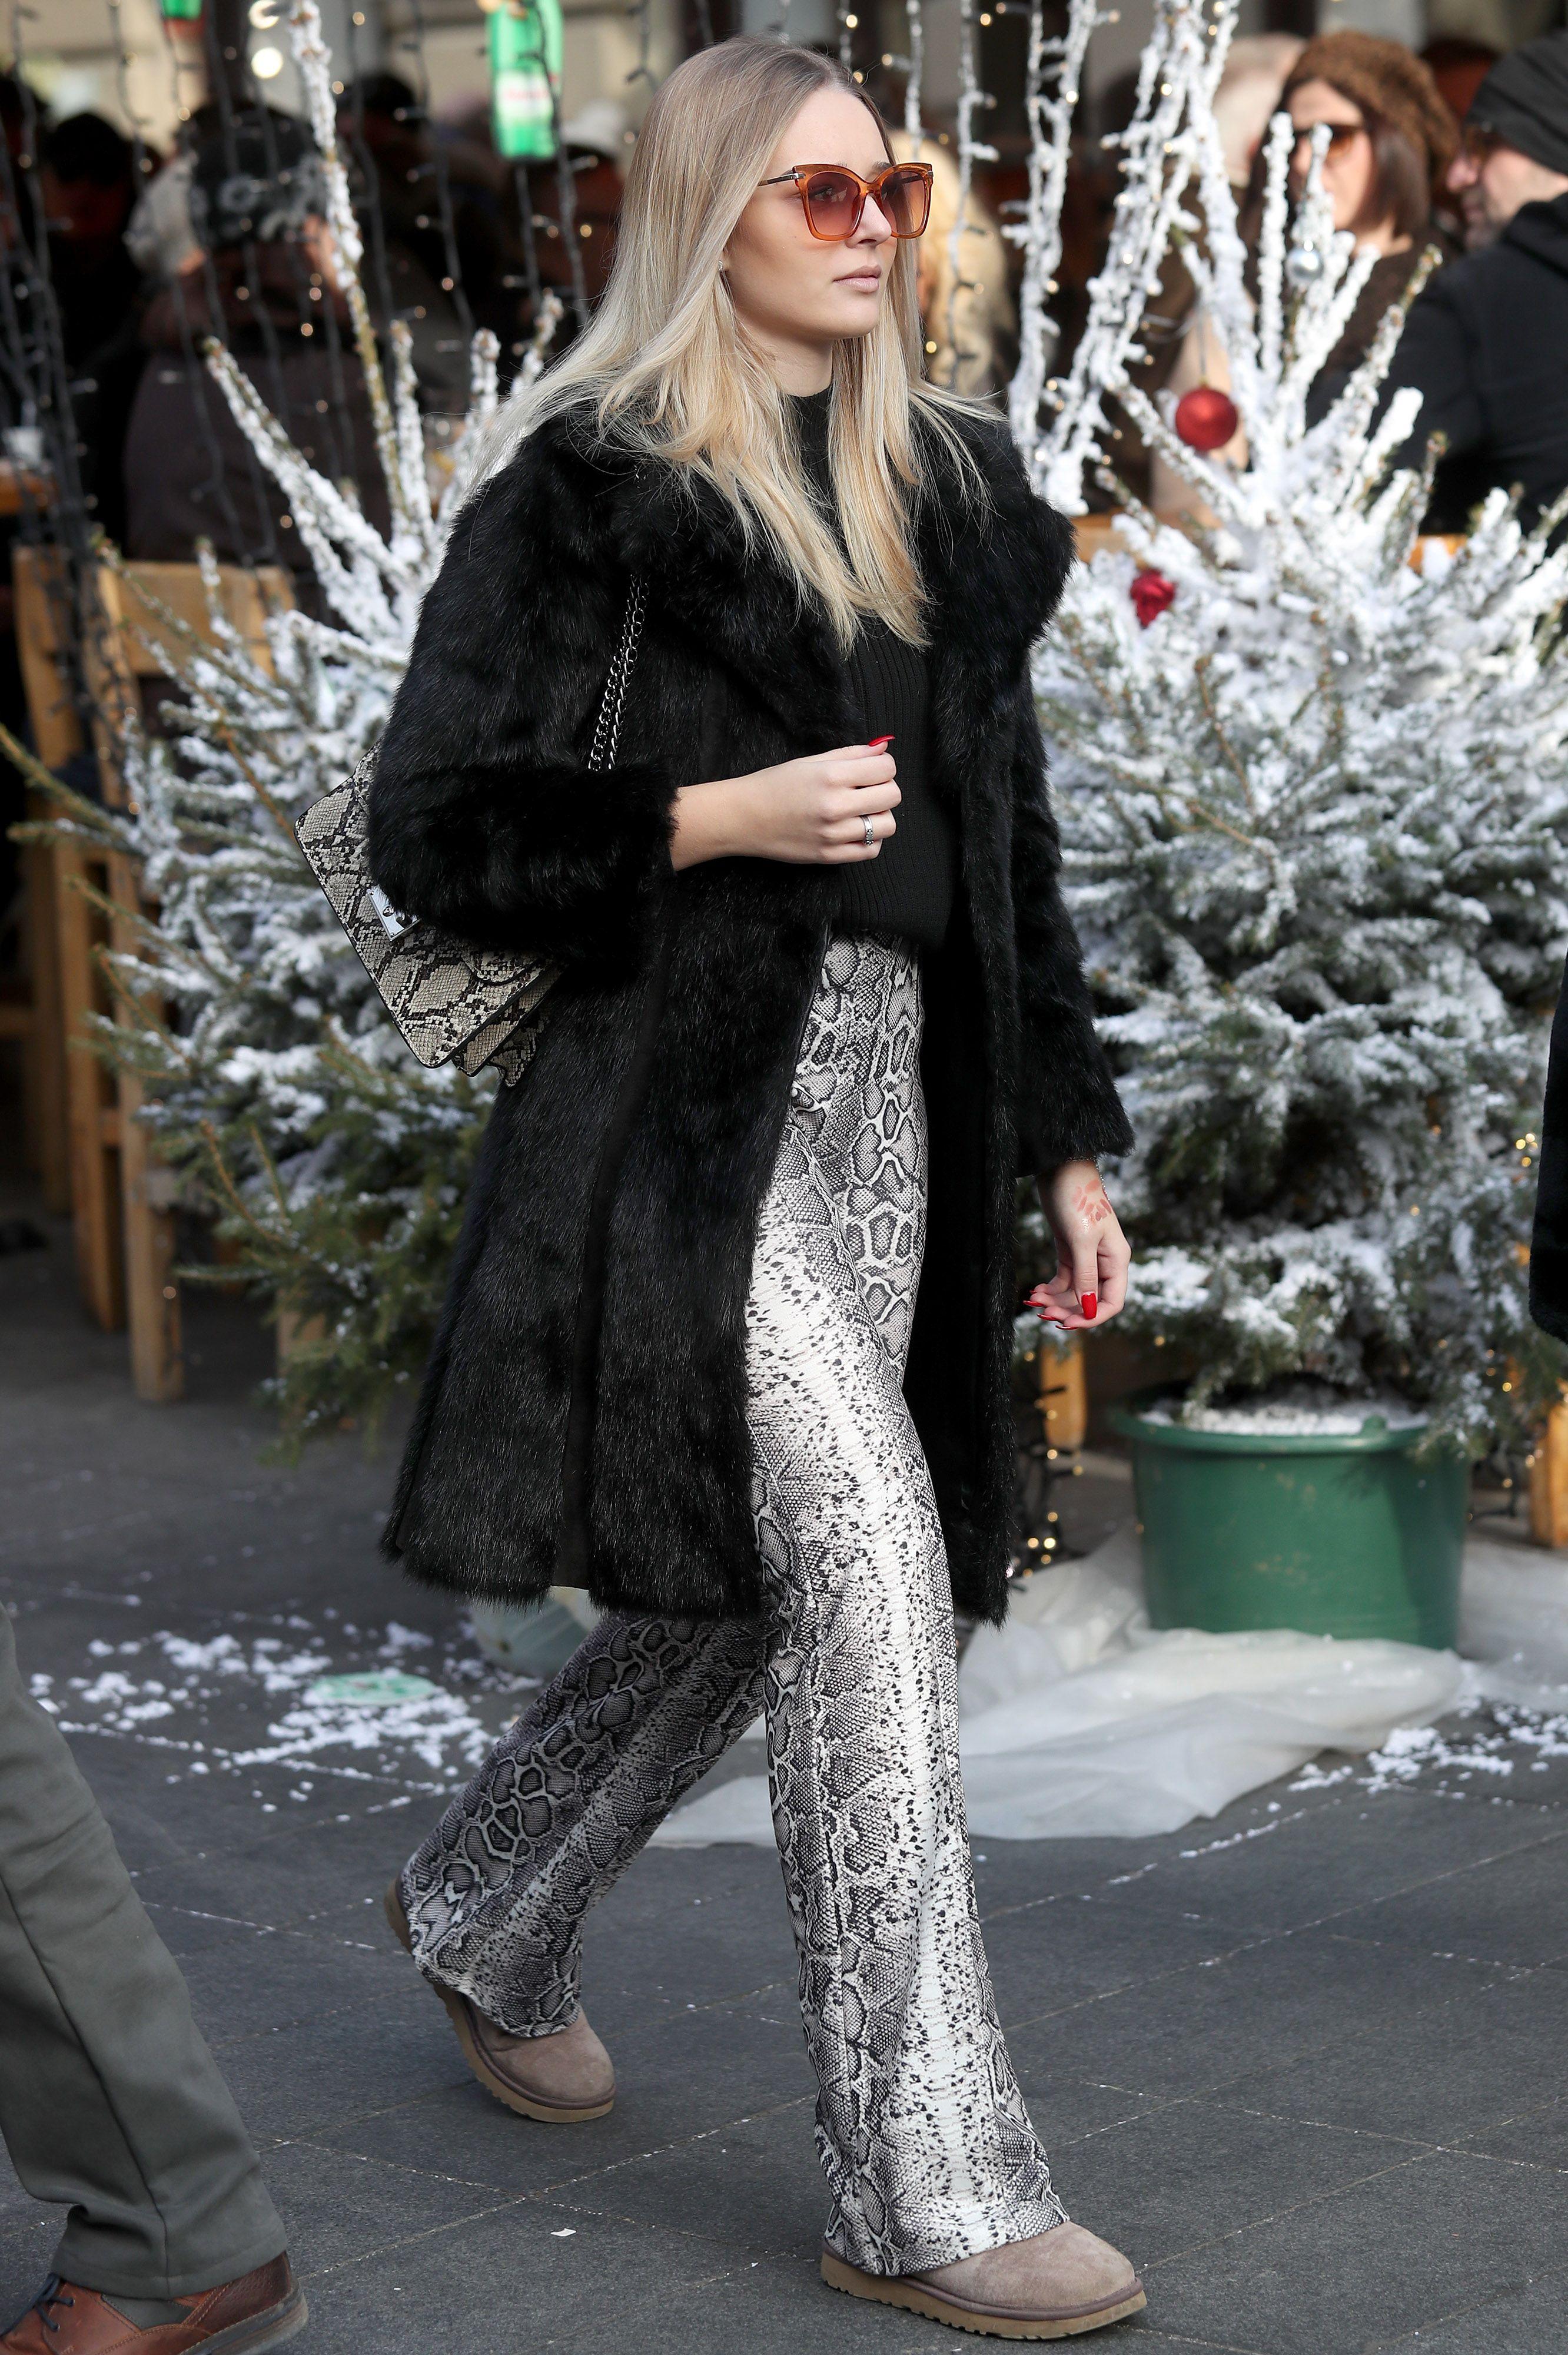 Ne morate ih voljeti, no morate priznati: Ona odlično nosi hit hlače sezone!